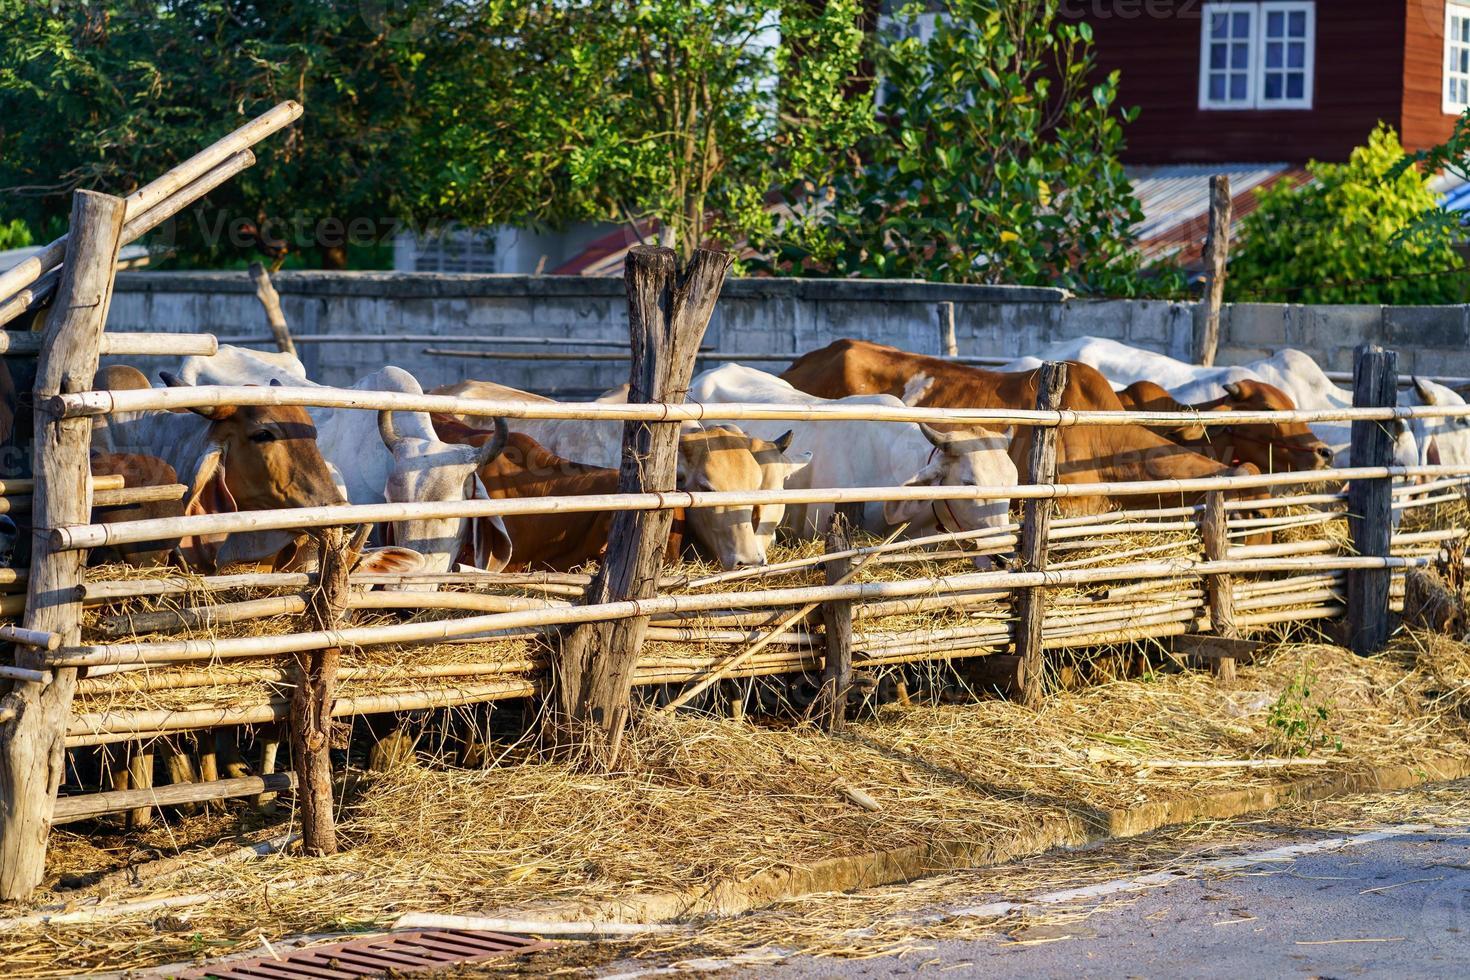 Cows in outdoor farm photo